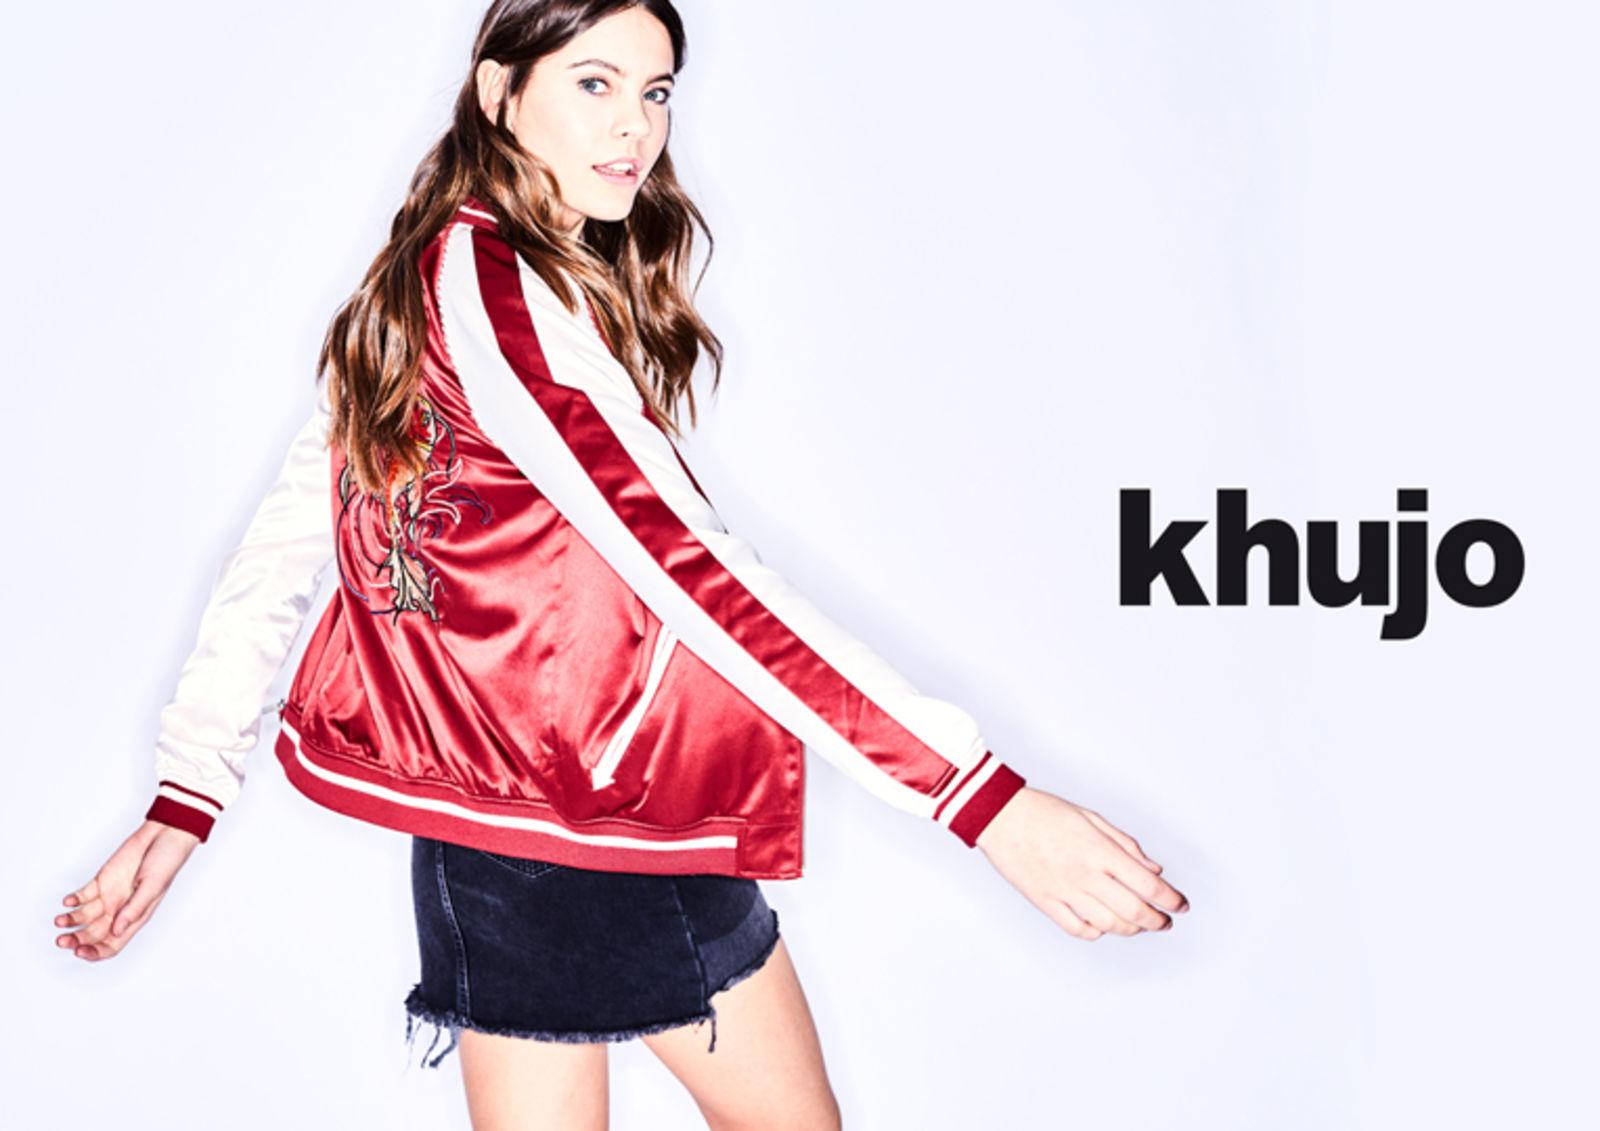 khujo (Bild 3)